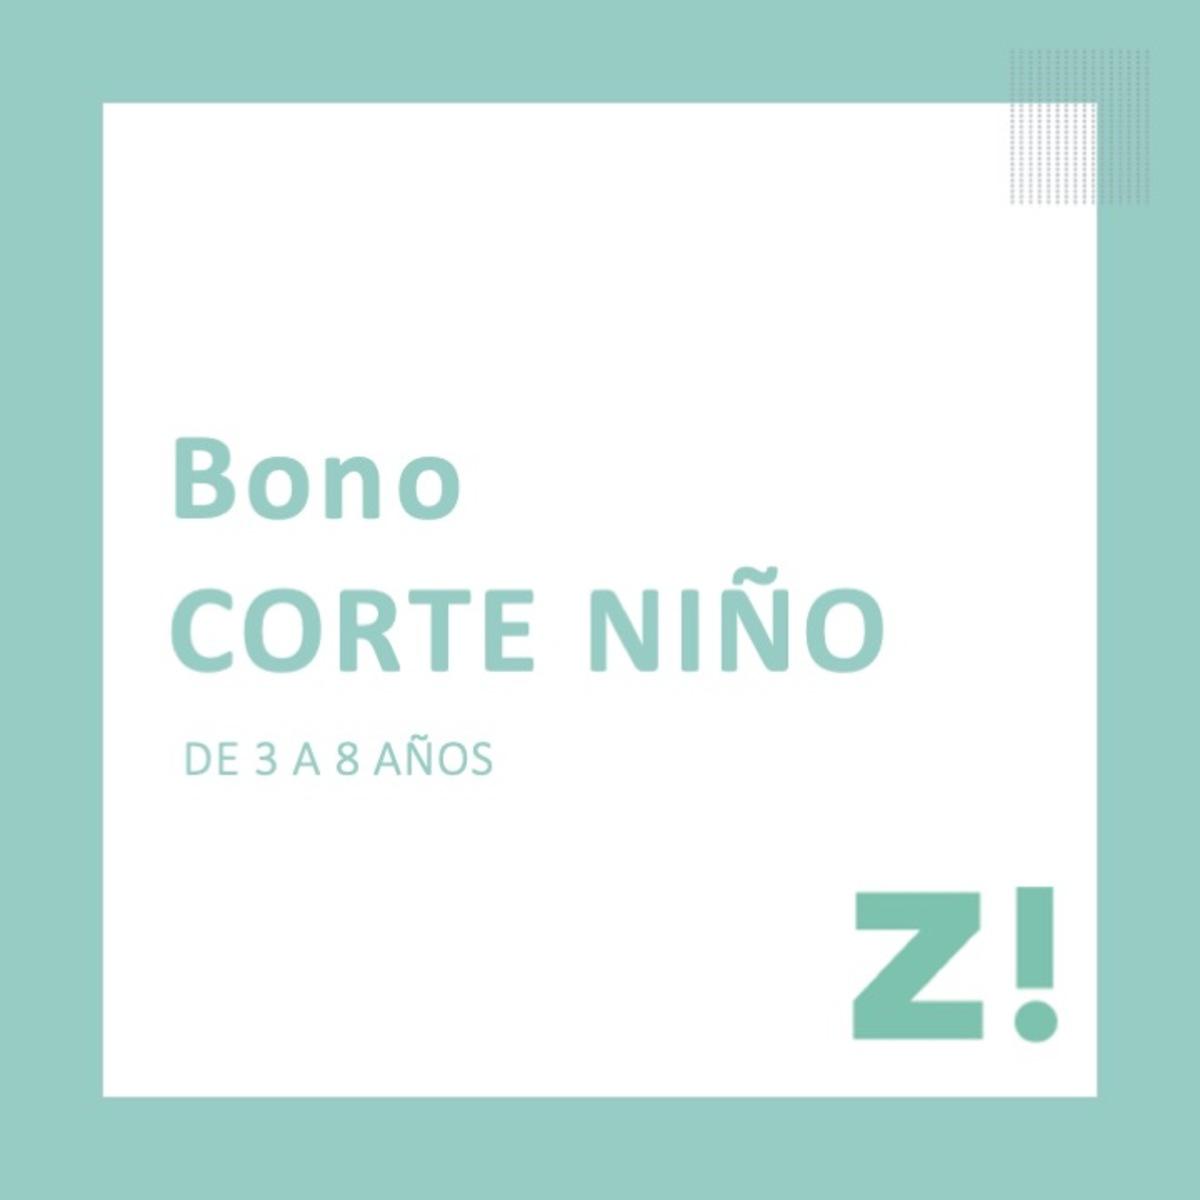 Bono corte niño PARA CANJEAR EN PASSARÓ PLAZA SAN BRIZ